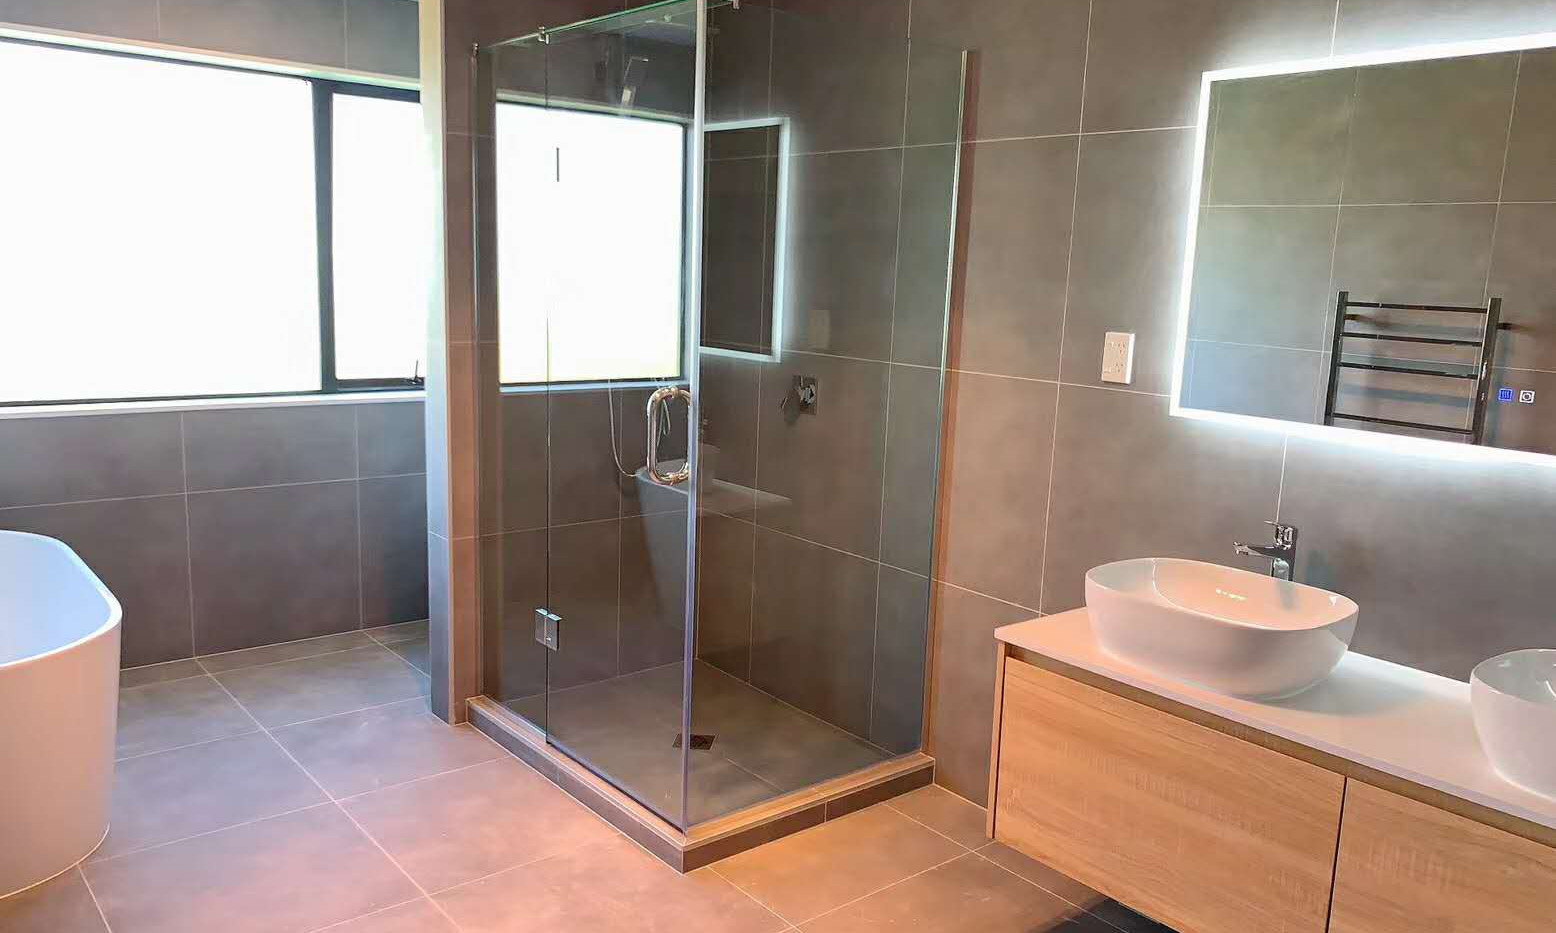 moonbay 1500 double bathroom vanity+1400